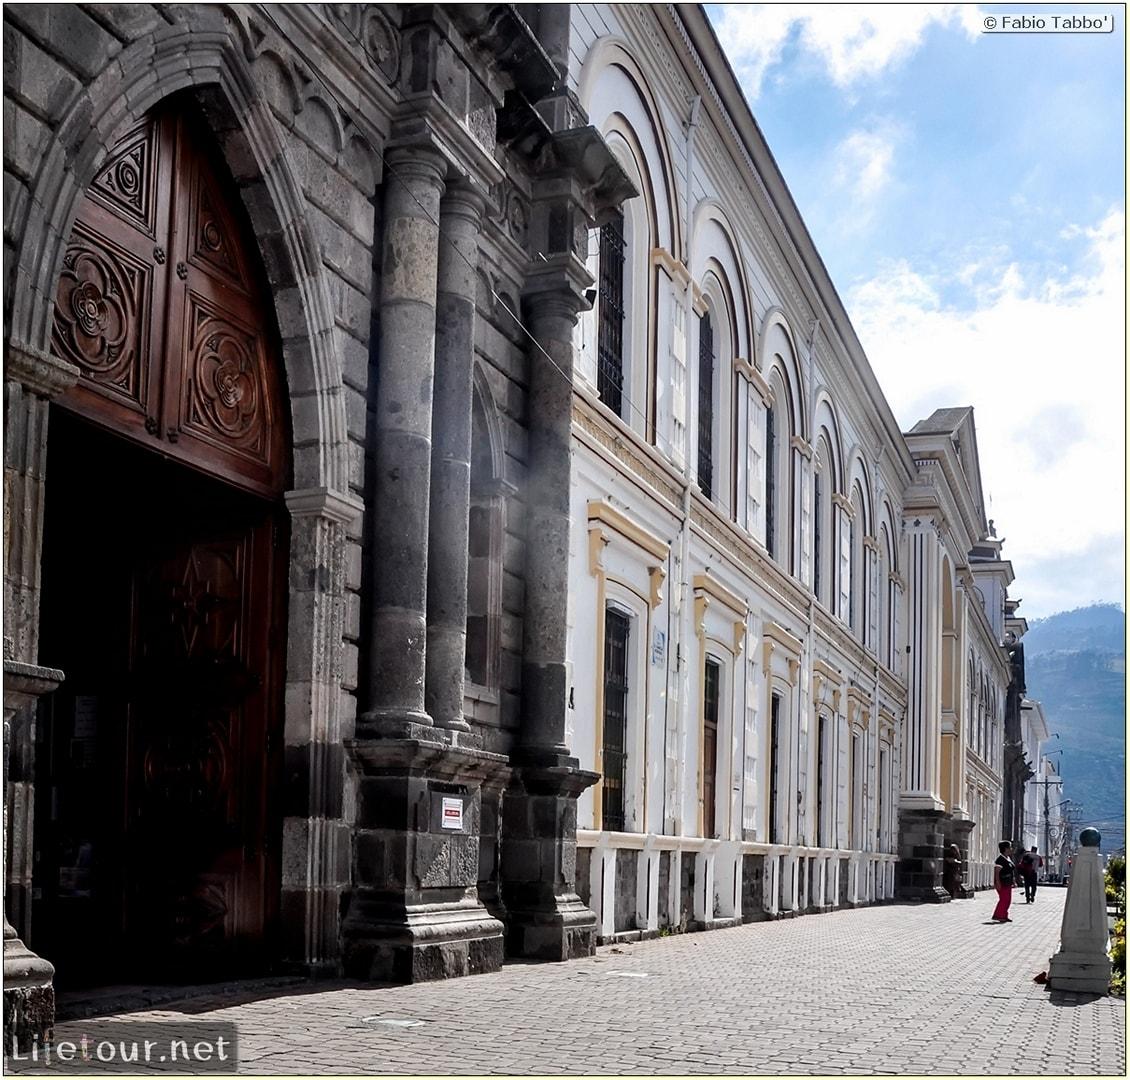 Fabio_s-LifeTour---Ecuador-(2015-February)---Ibarra---Capilla-Episcopal---10215 COVER